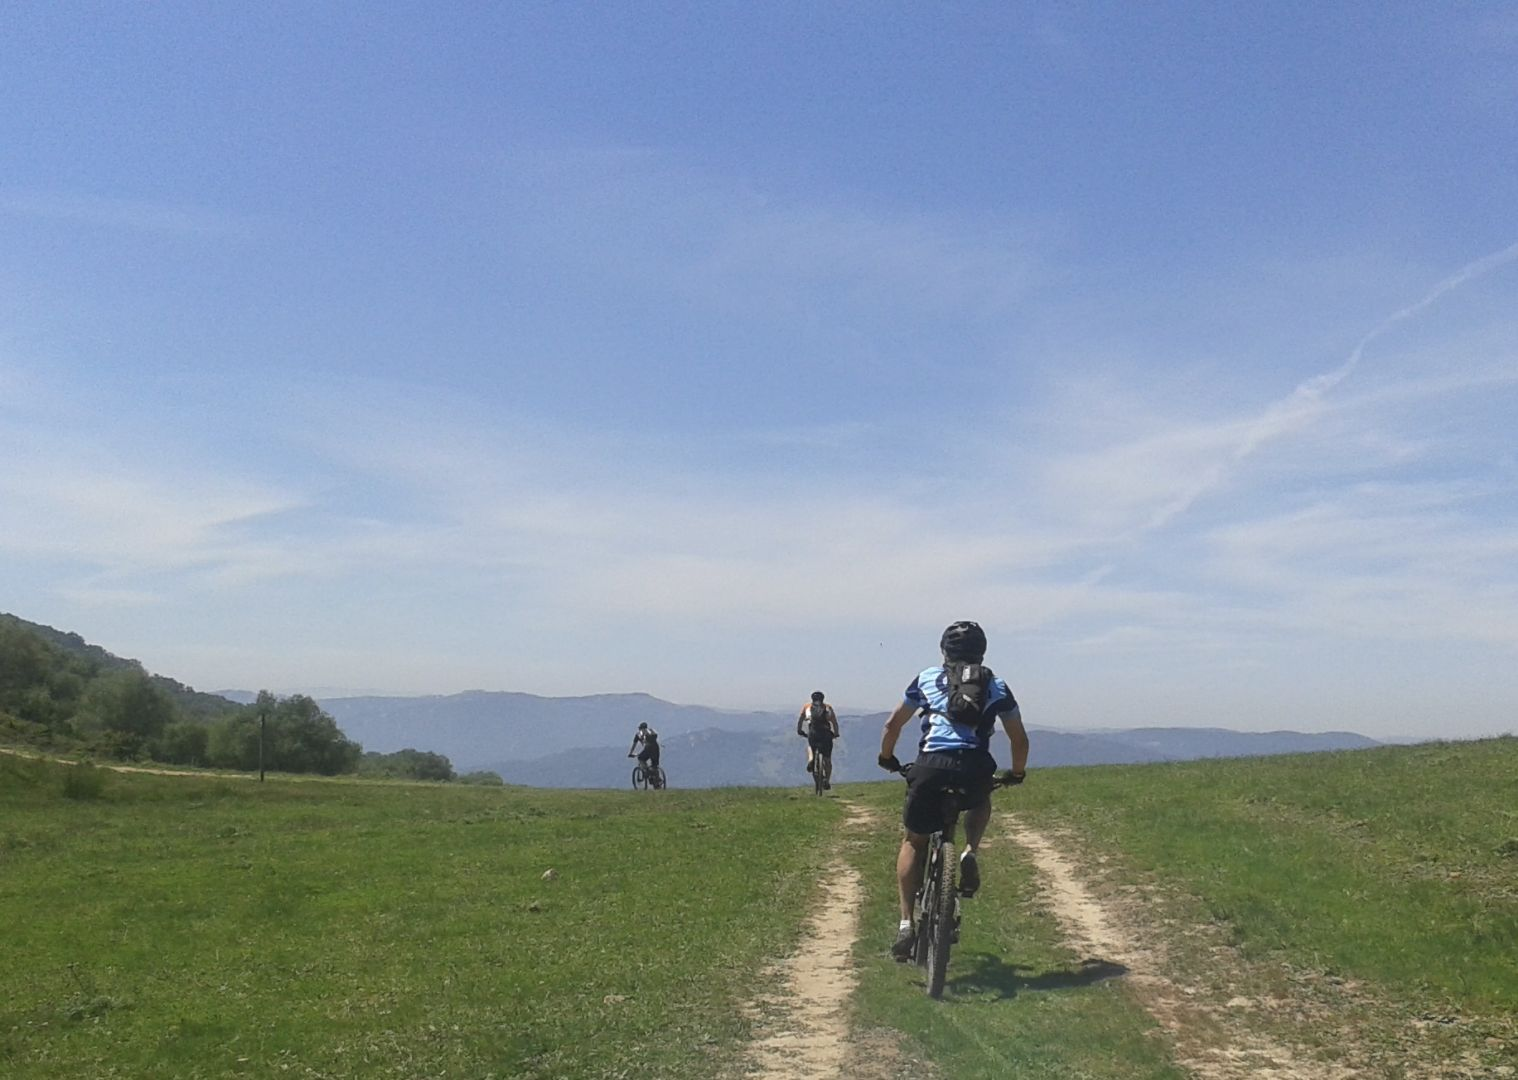 mountainbikingspain10.jpg - Spain - Ruta de la Plata - Guided Mountain Bike Holiday - Mountain Biking